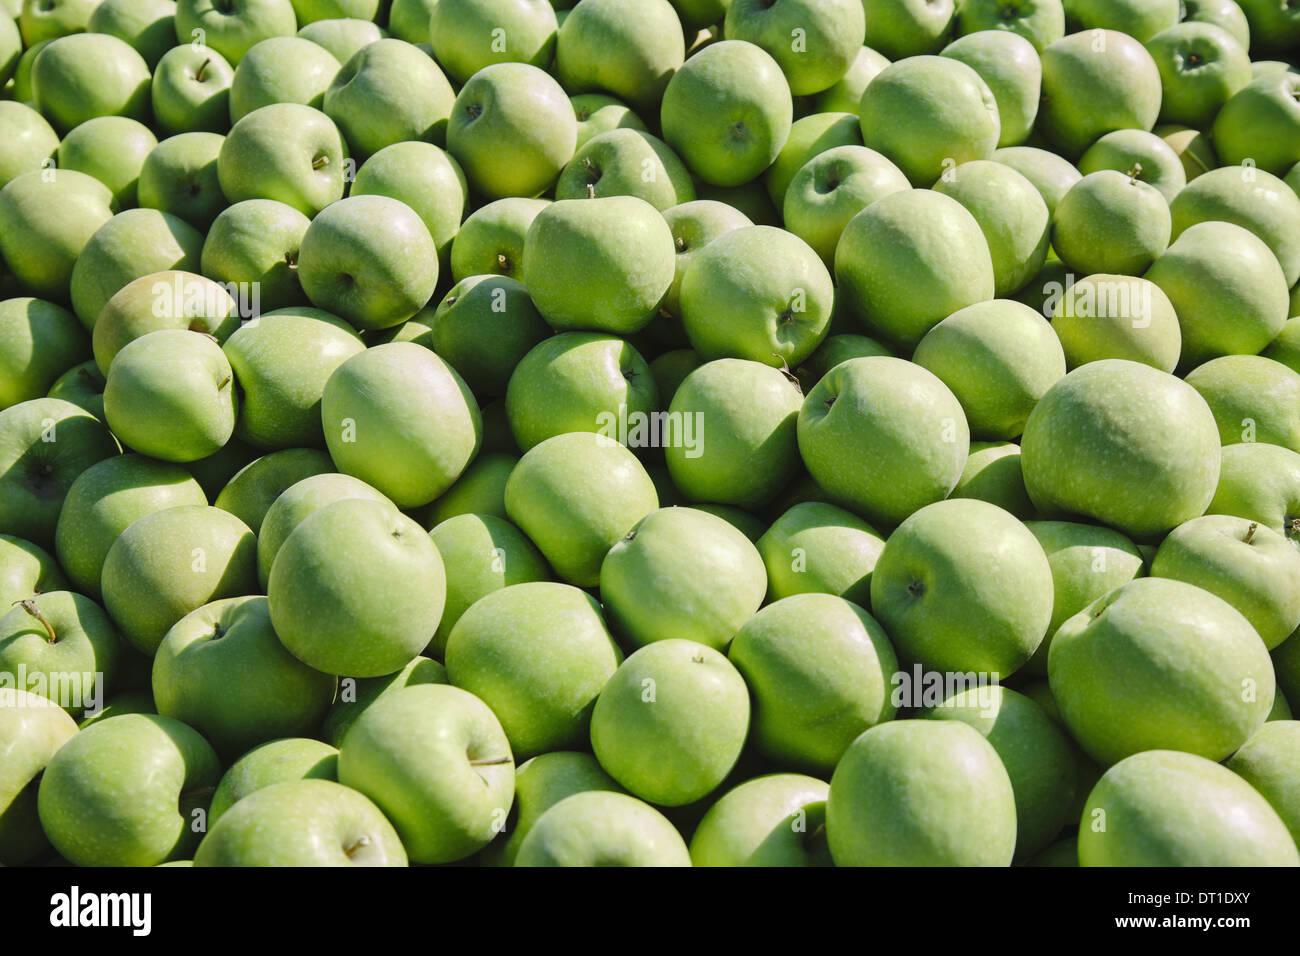 Washington State USA Granny Smith apples - Stock Image